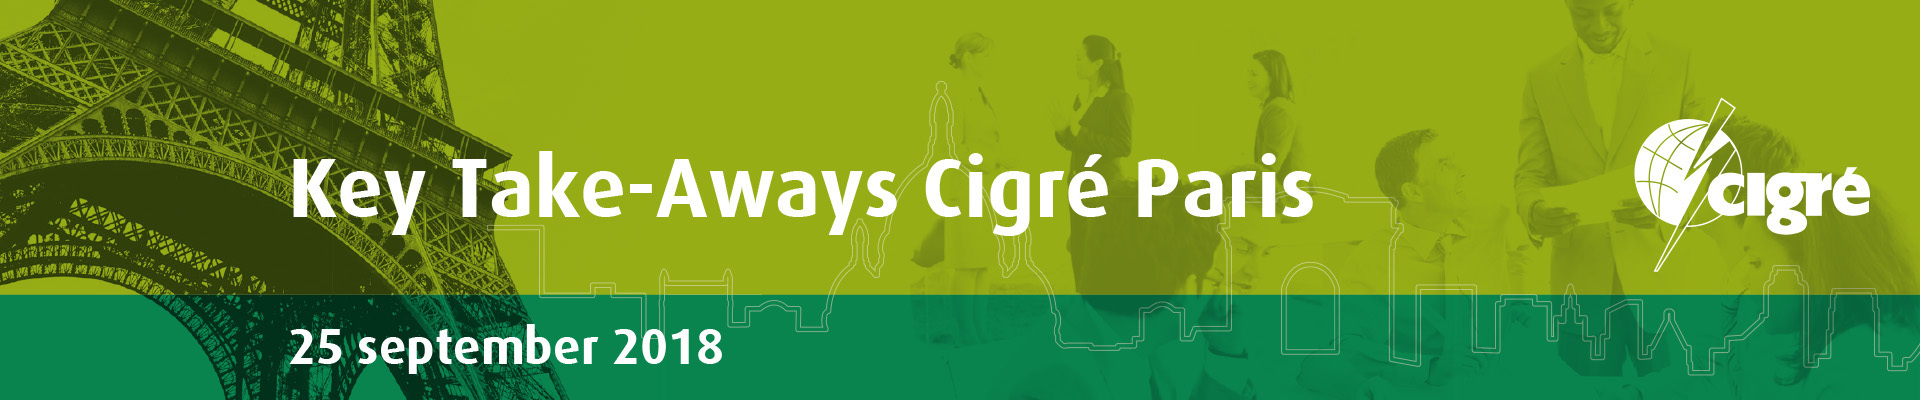 Key Take-Aways Cigre Paris